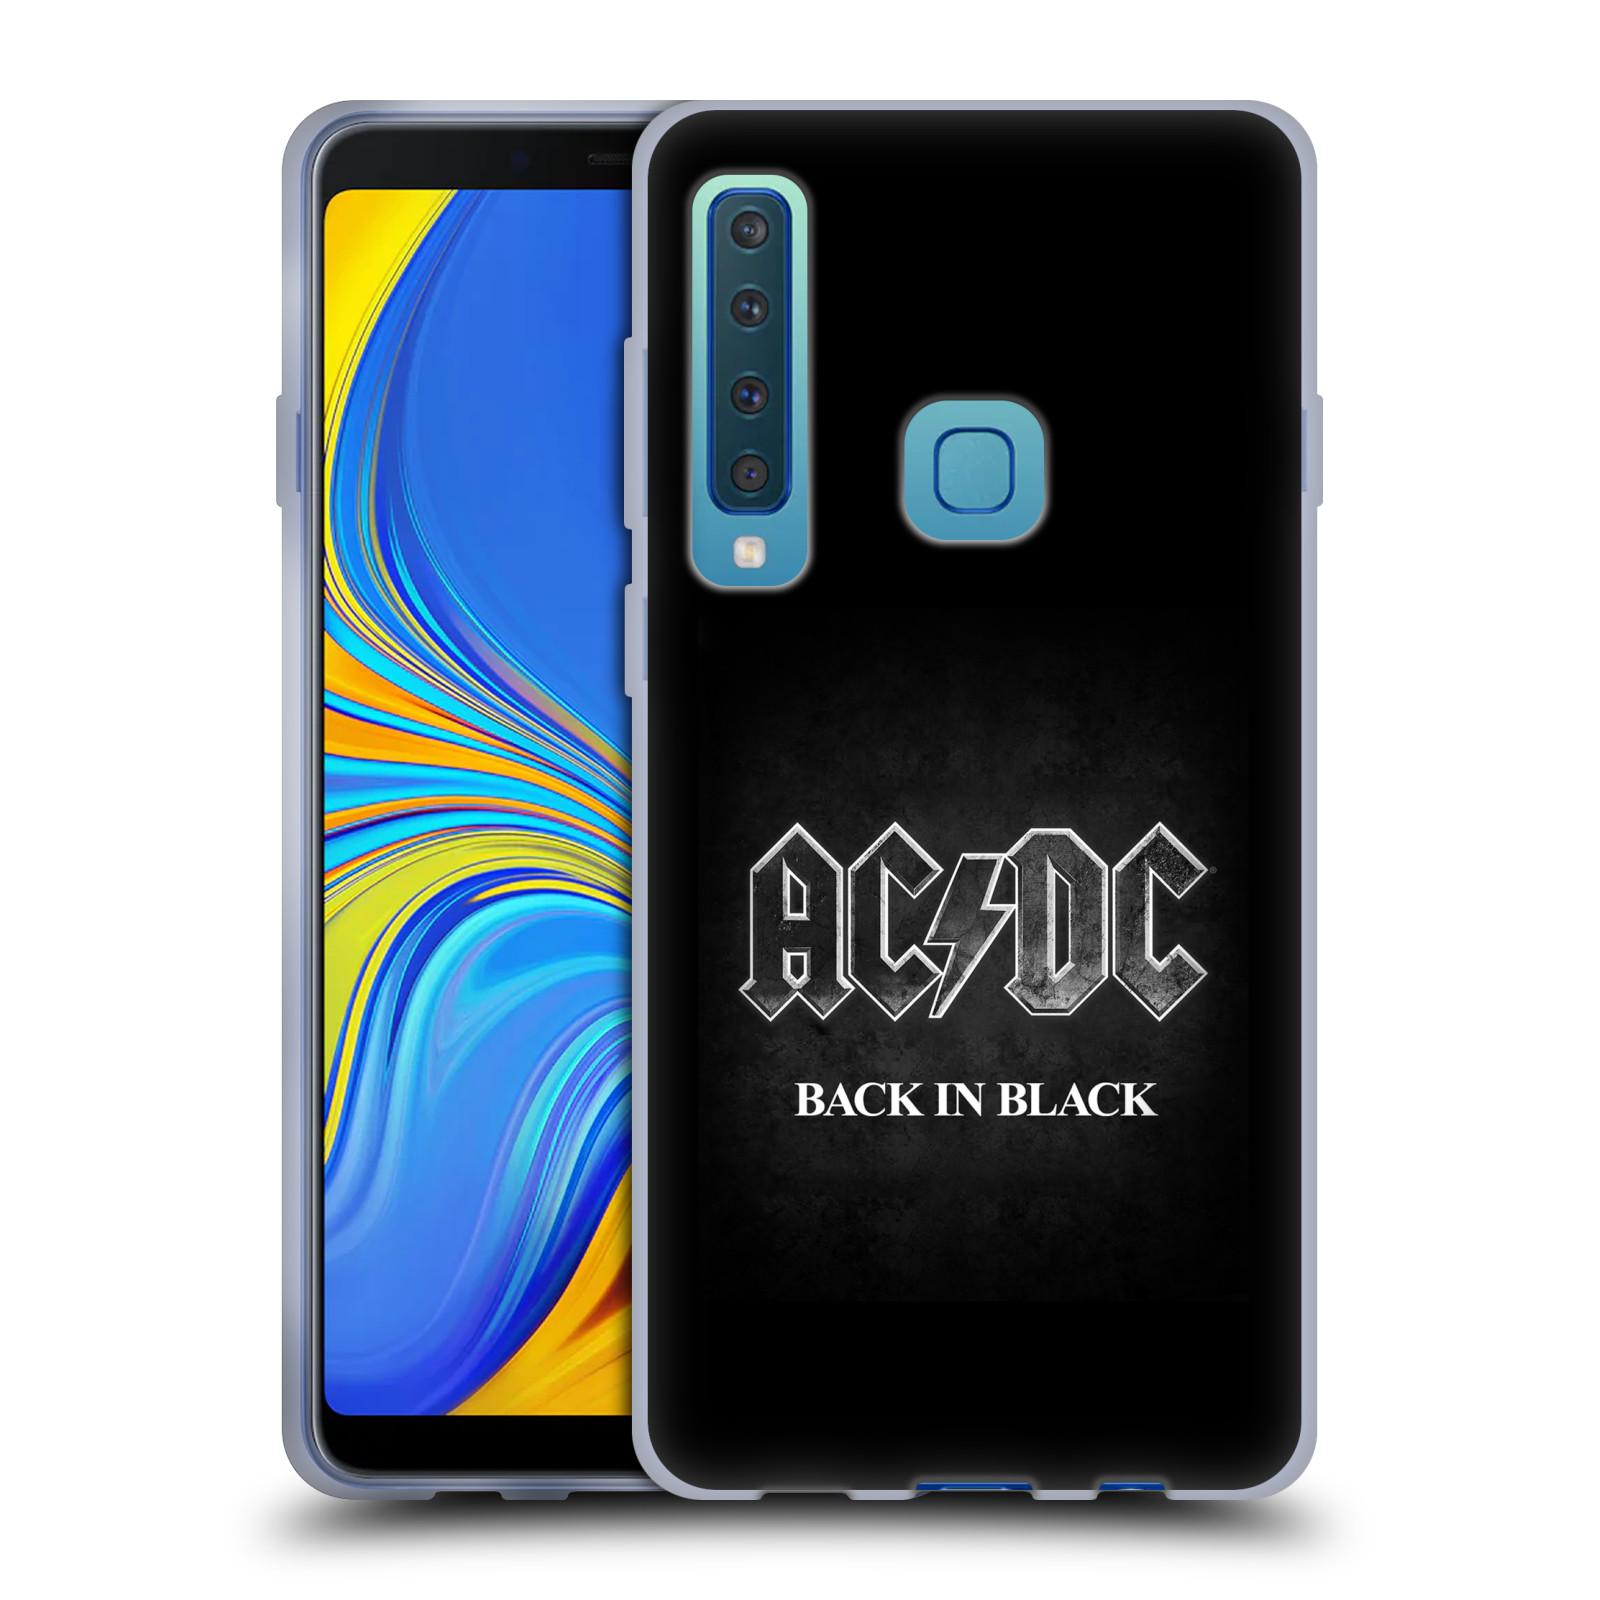 Silikonové pouzdro na mobil Samsung Galaxy A9 (2018) - Head Case - AC/DC BACK IN BLACK